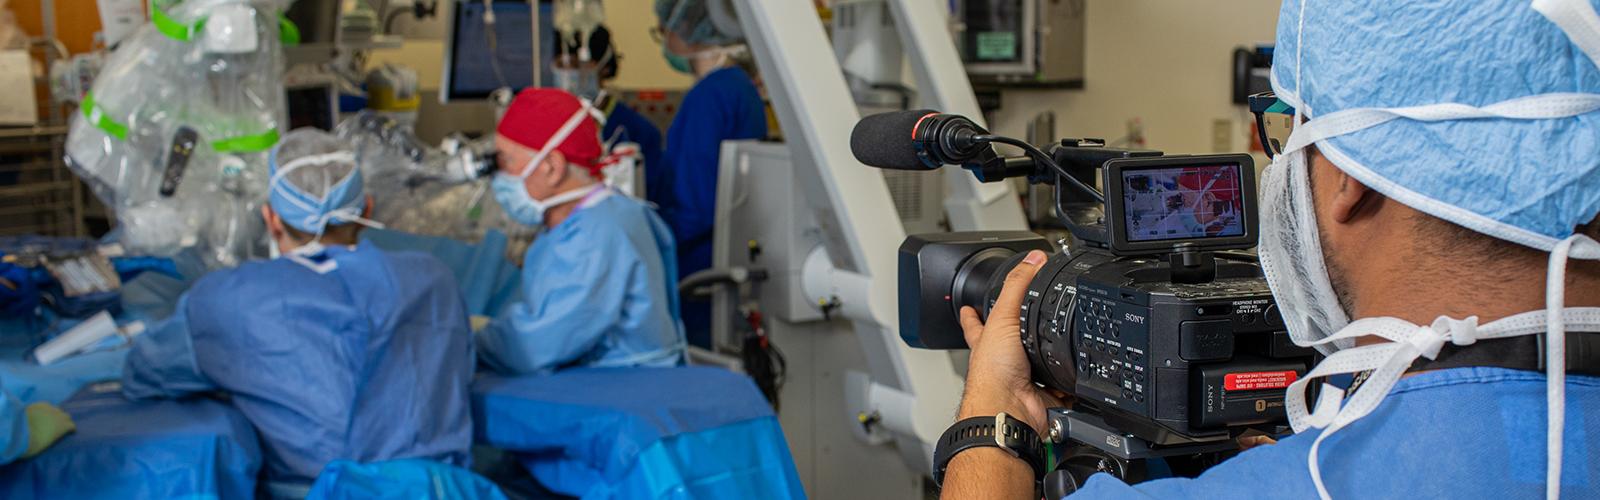 Media Specialist Pathum Karunaratne shoots video for UW-Madison Dept of Surgery